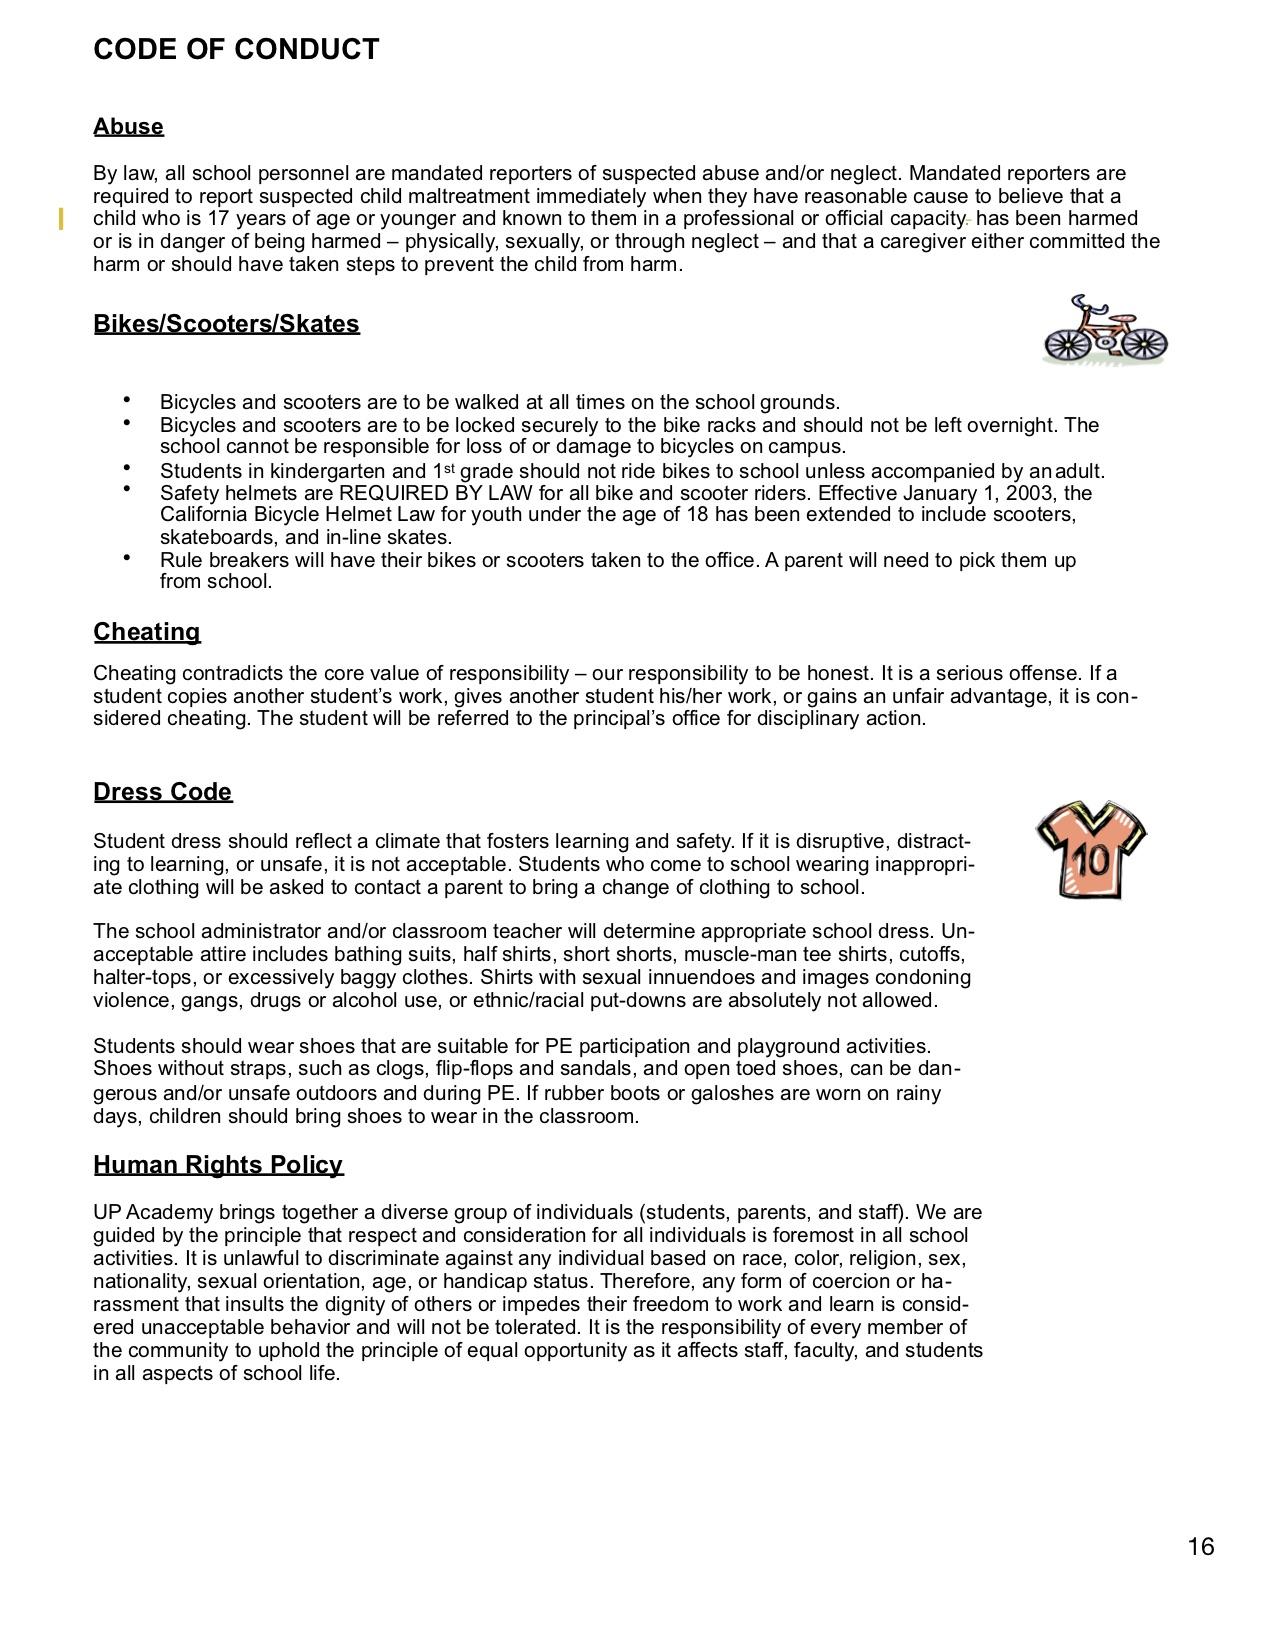 18-19 Parent and Student Handbook V4-15.jpg